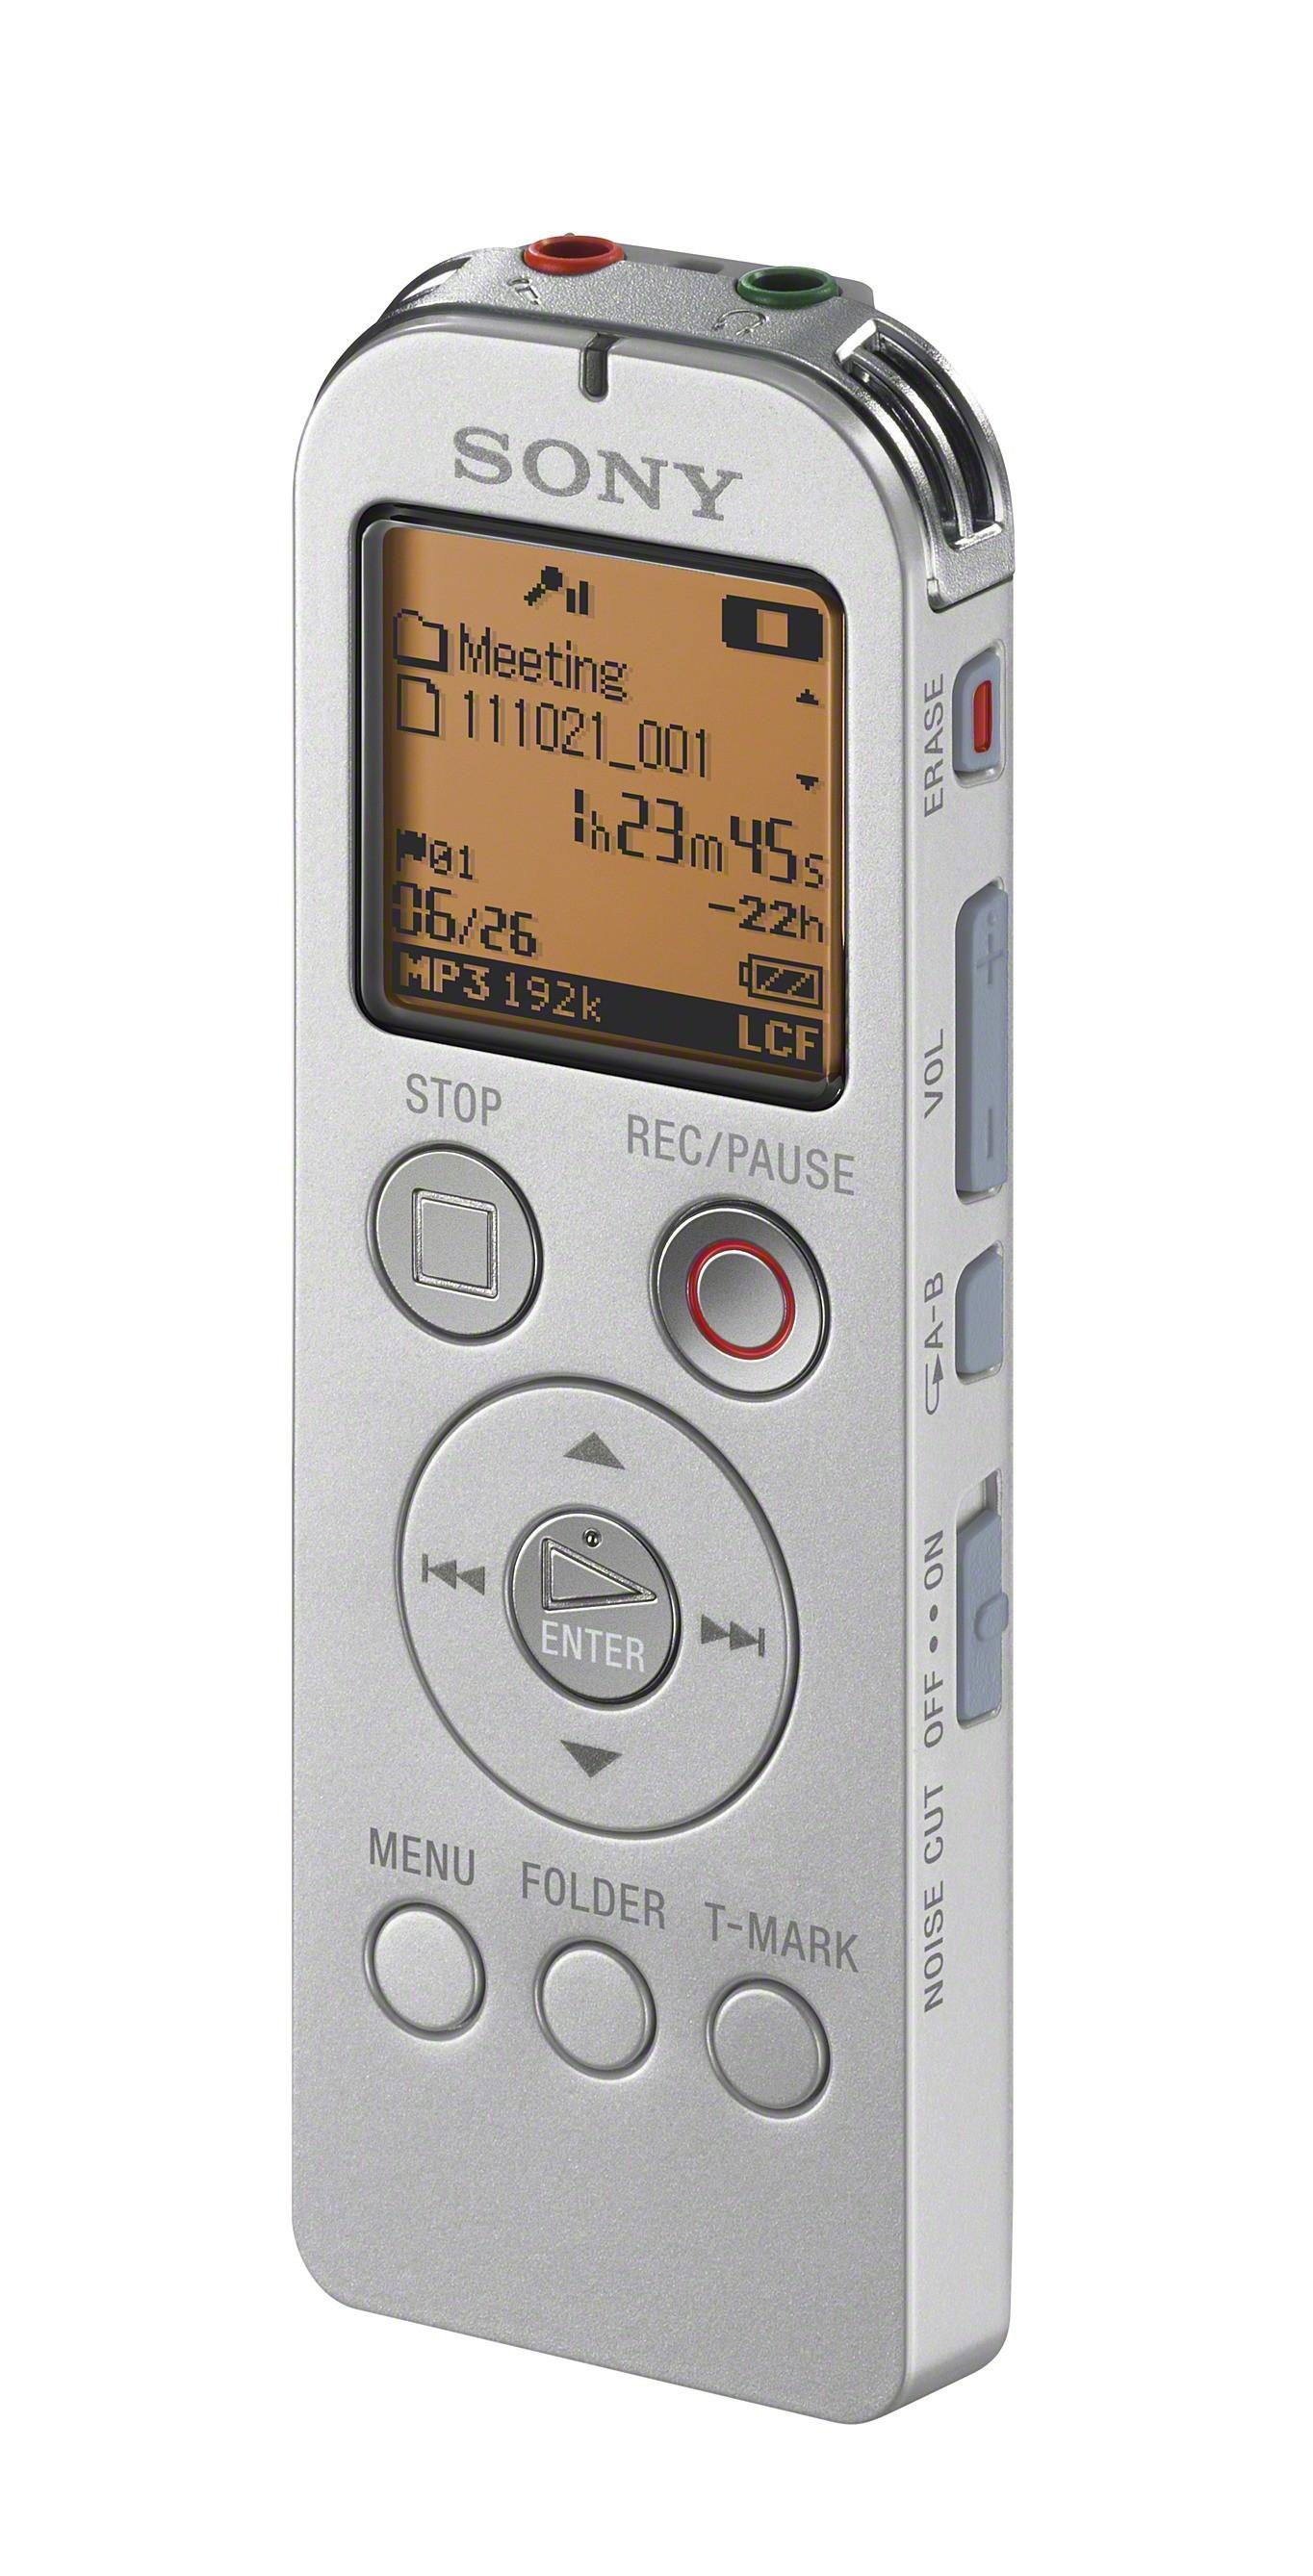 Sony ICD-UX523FW diktafon hvid